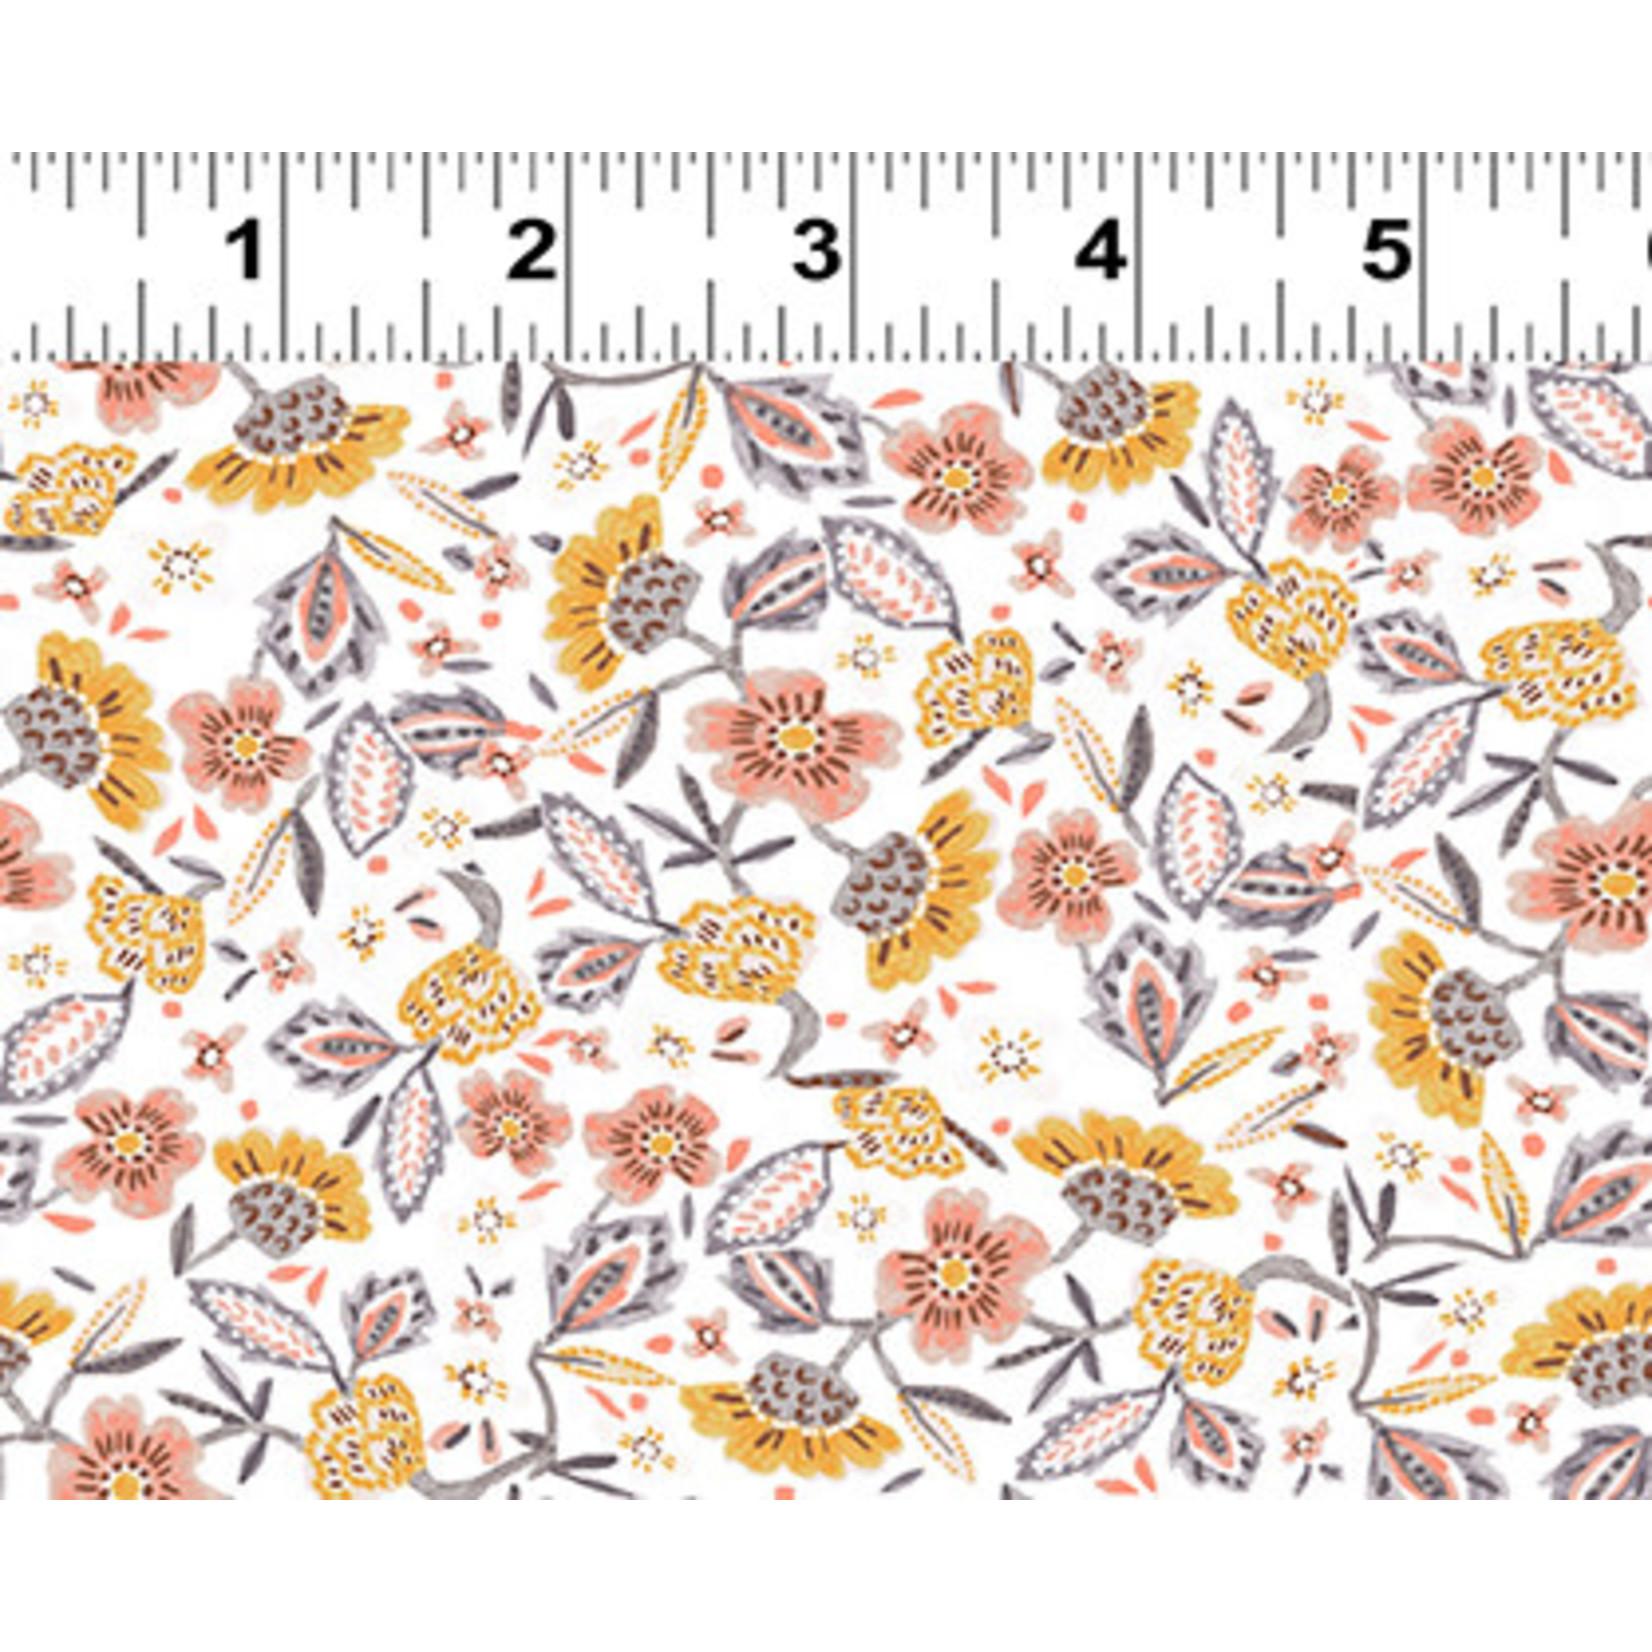 Clothworks Uptown, Floral, White Y3141-1 $0.20 per cm or $20/m